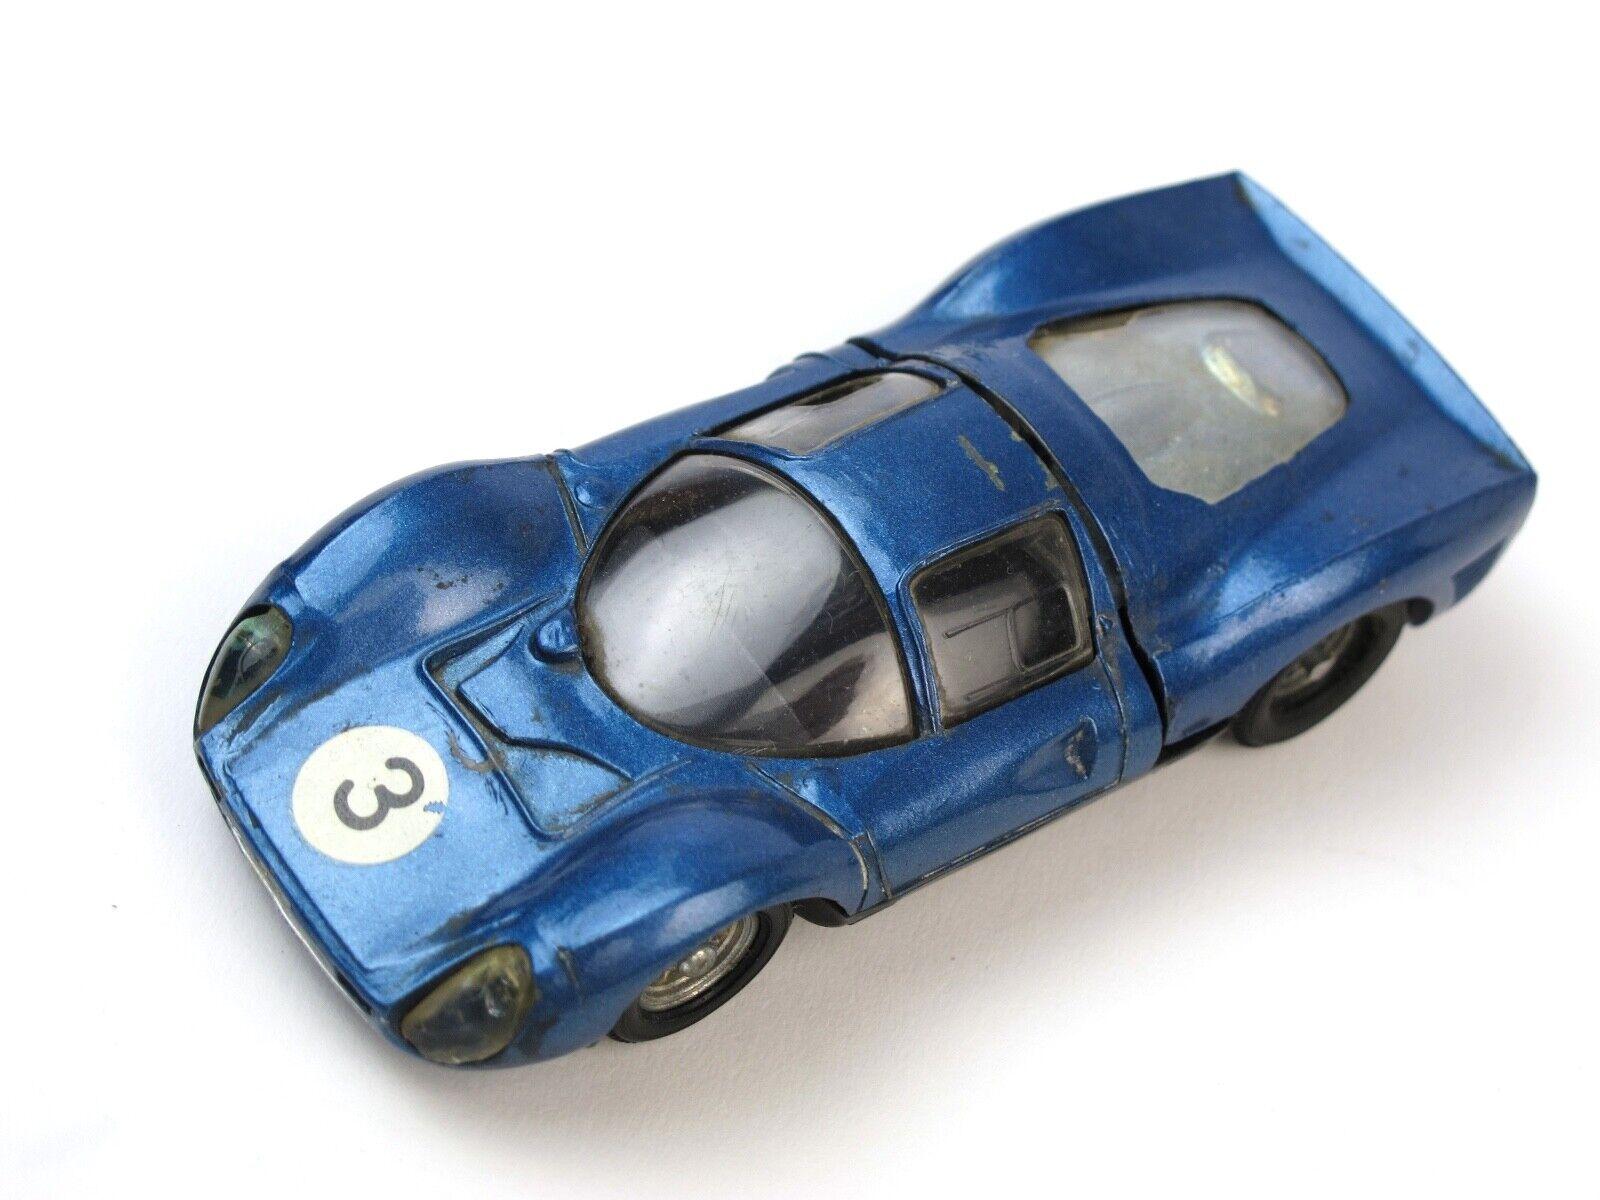 sin mínimo Solido Brosol ref. 152 ferrari 330 p3 Industria Industria Industria Brasileira 1 43 azul serie 100  mejor marca